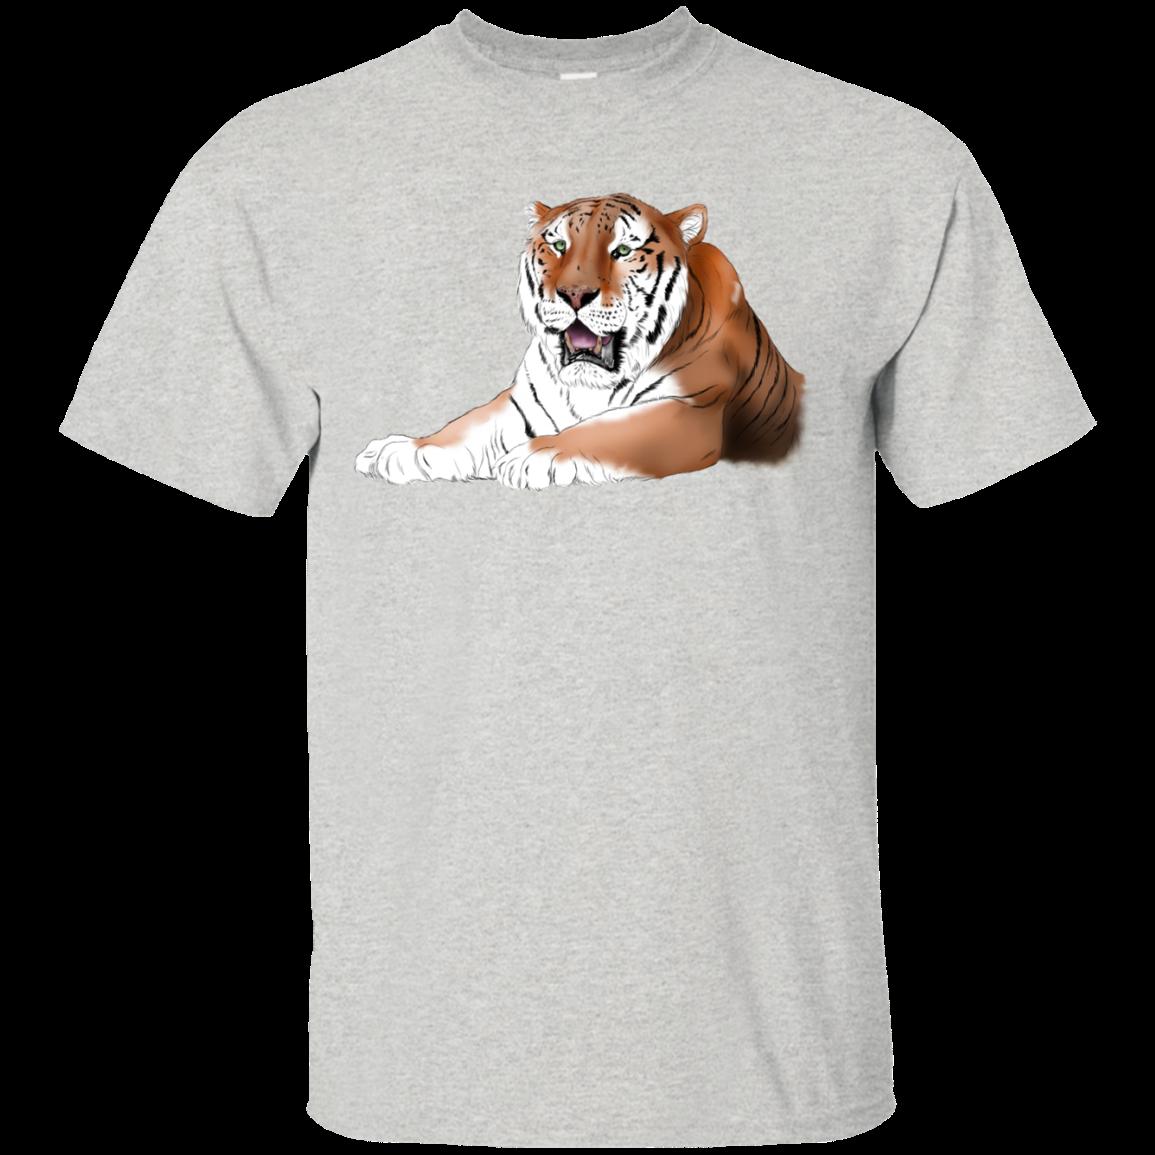 TJ Tiger Color G200 Gildan Ultra Cotton TShirt (With